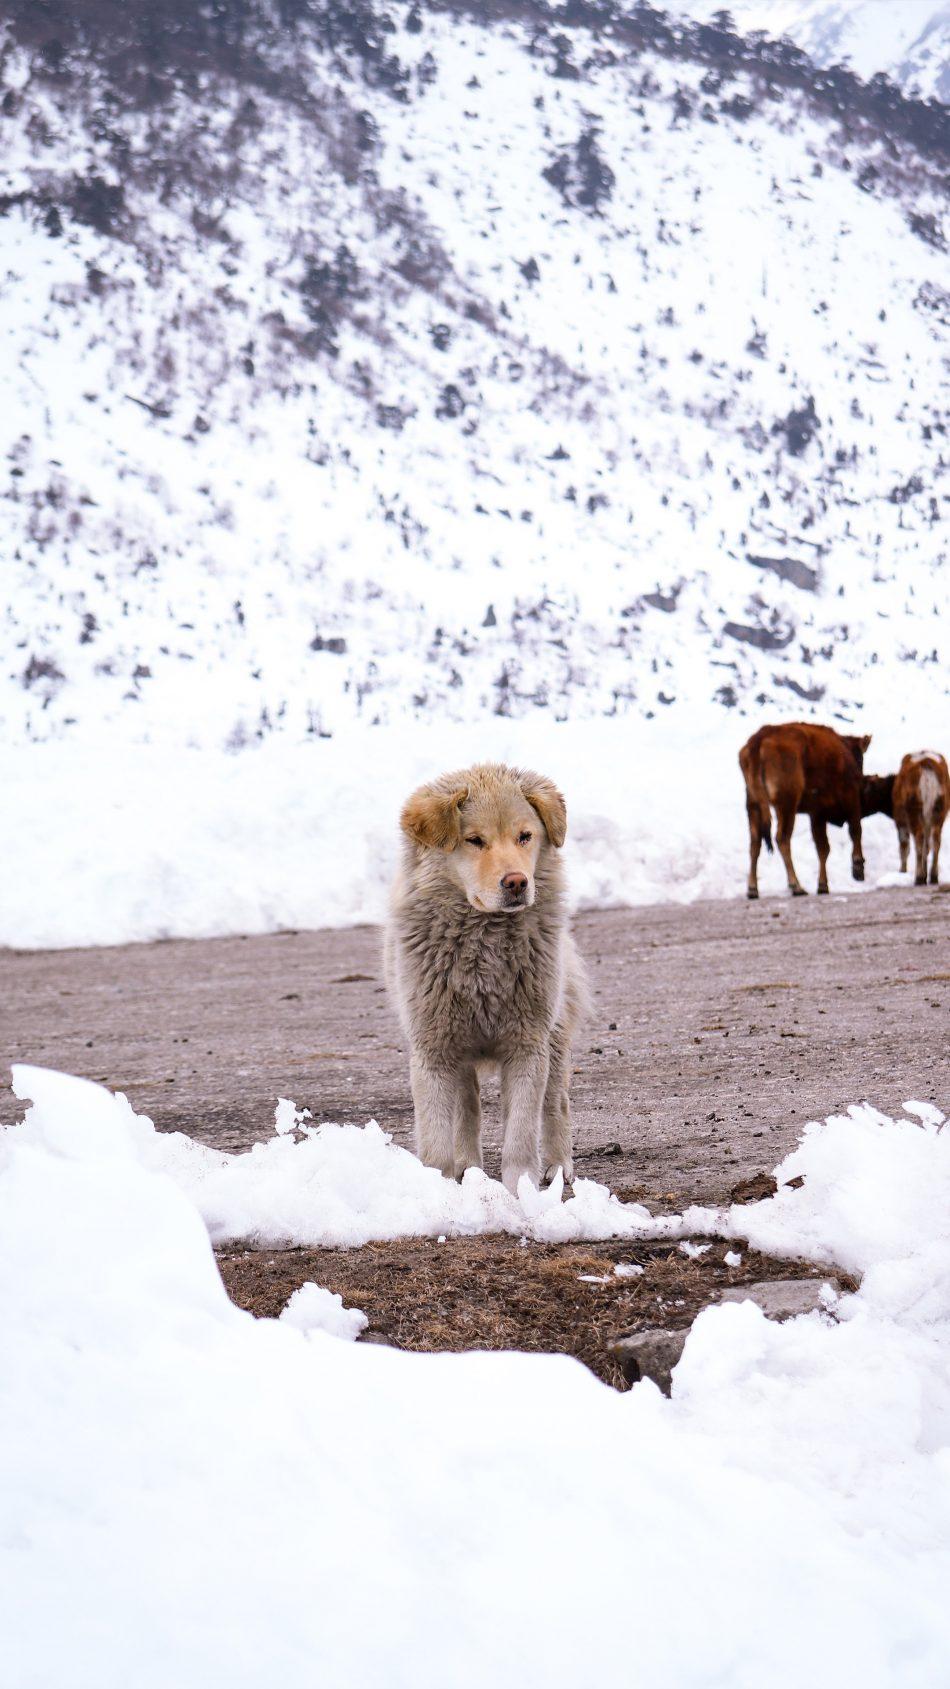 Himalayan Dog Winter Snow 4K Ultra HD Mobile Wallpaper